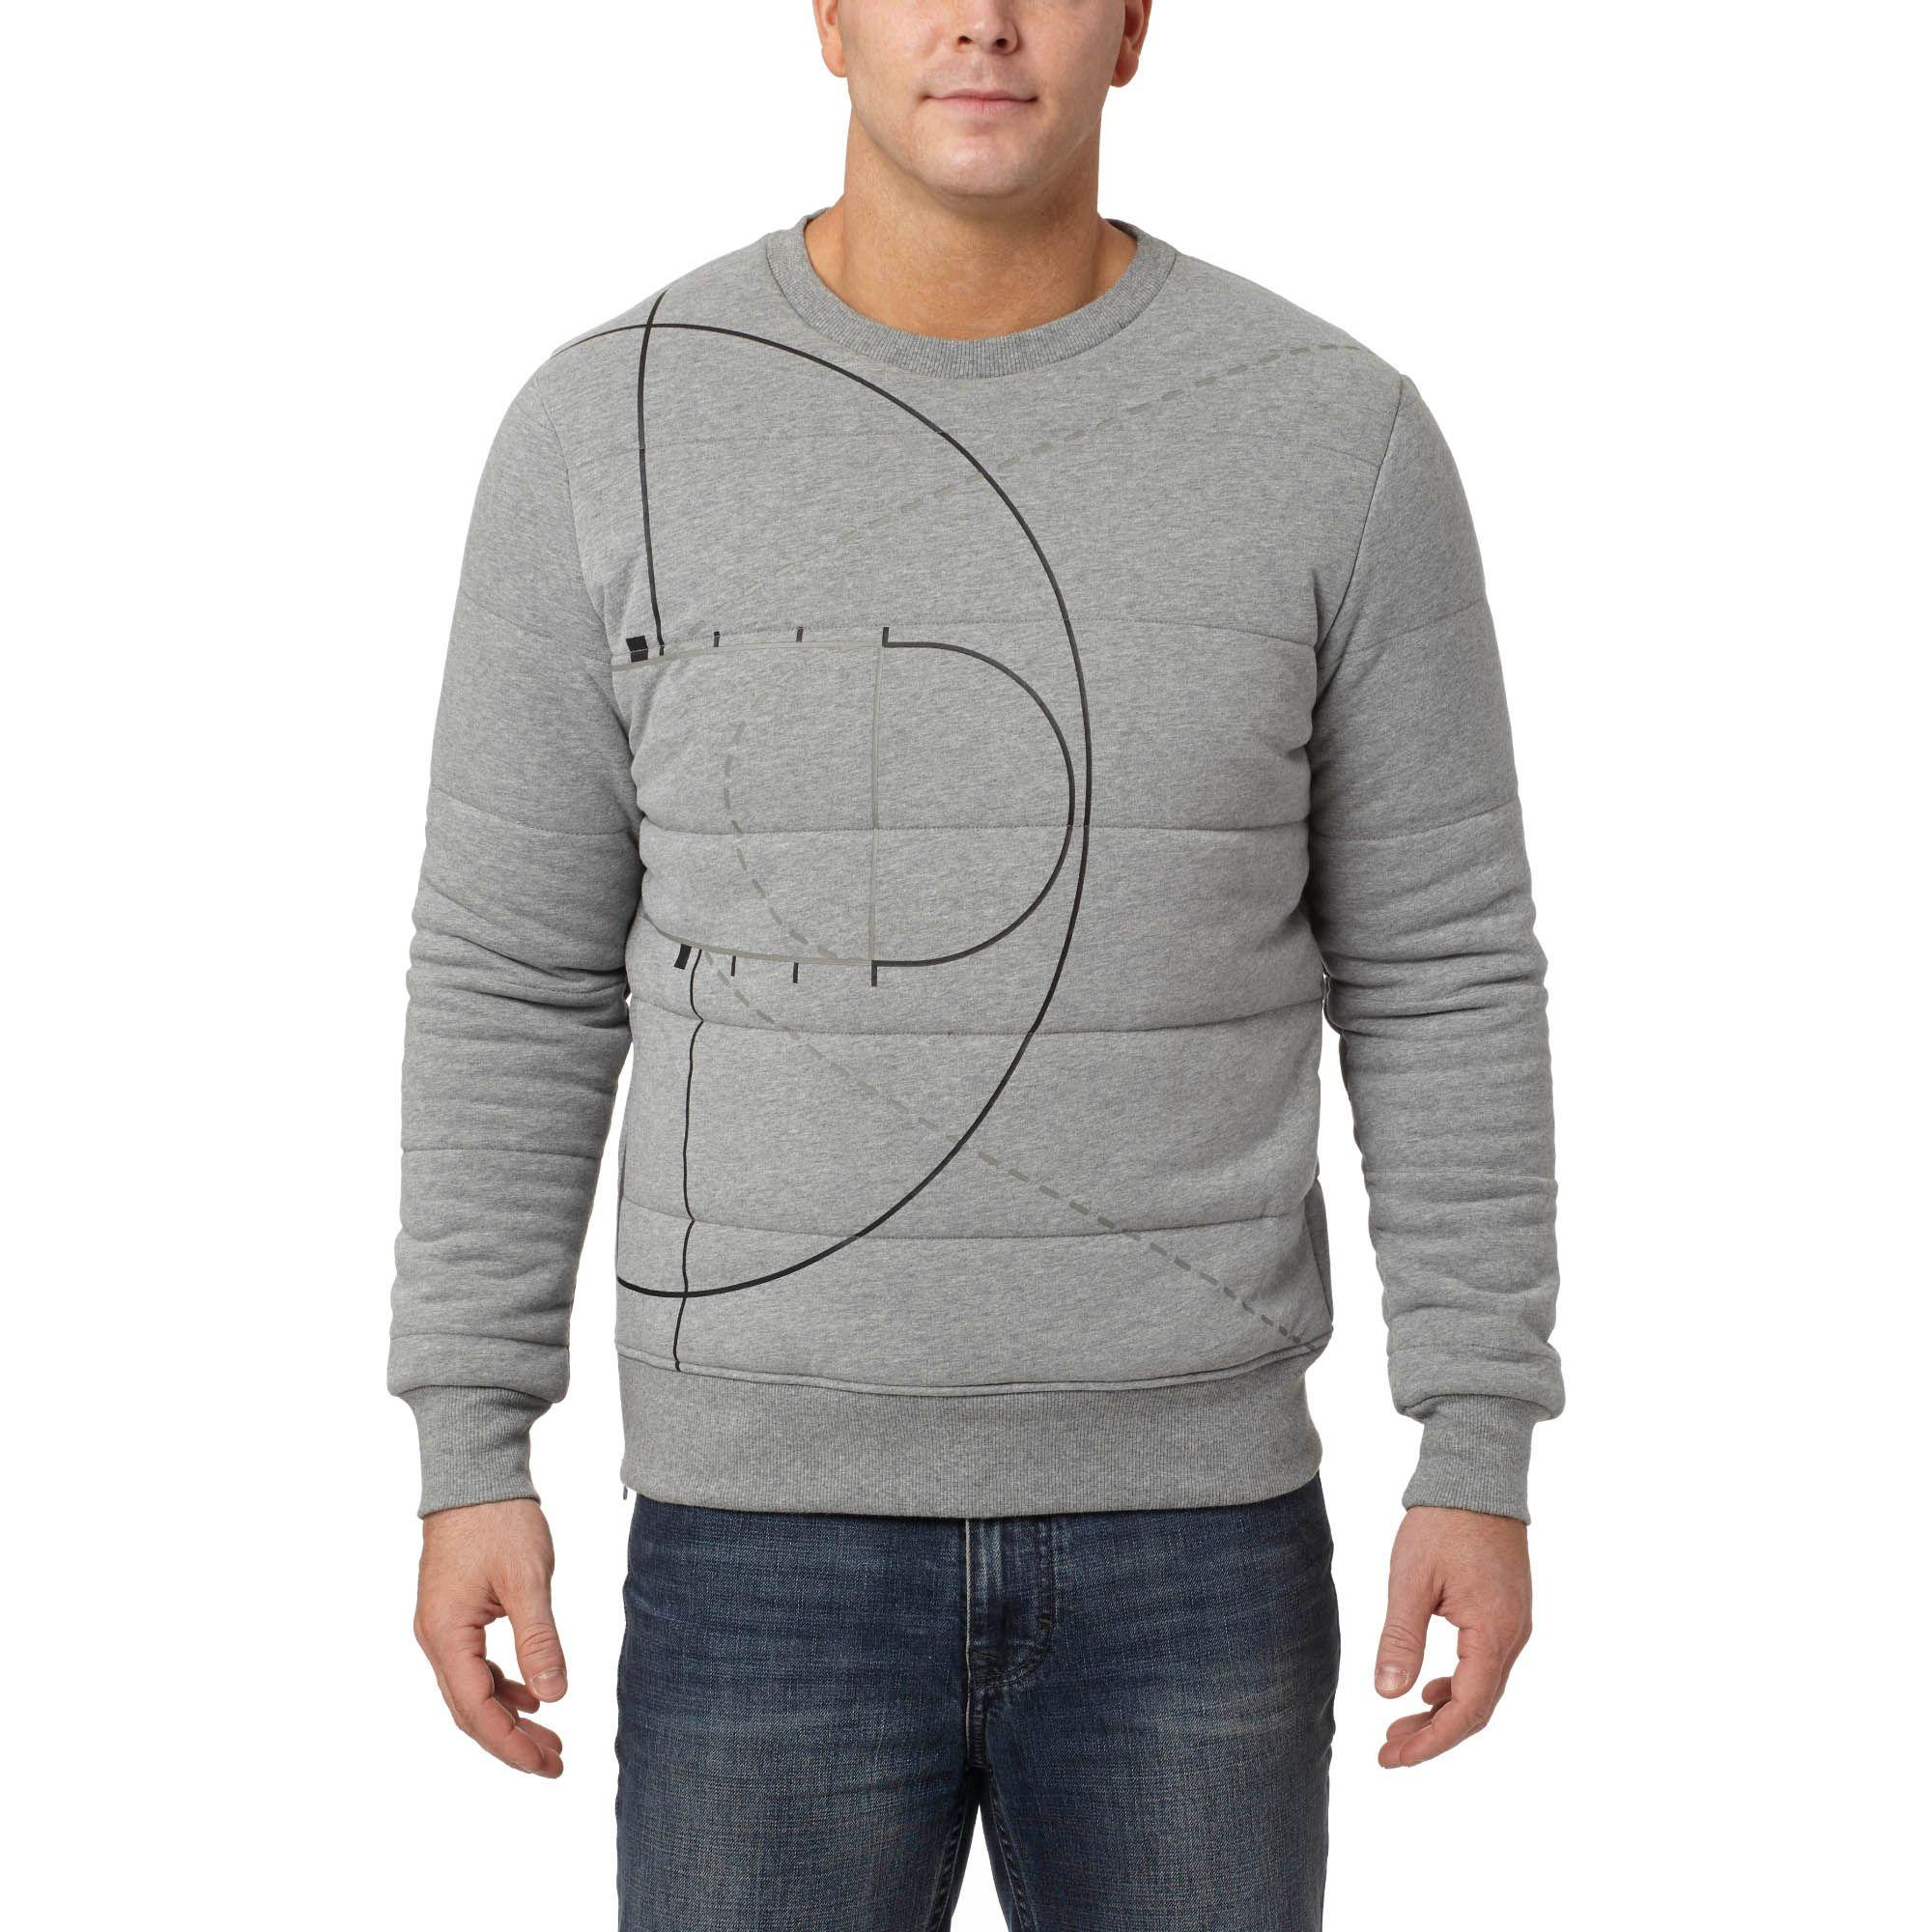 1b2b9bc9fad7 Lyst - PUMA Evo Graphic Padded Crew Sweatshirt in Gray for Men